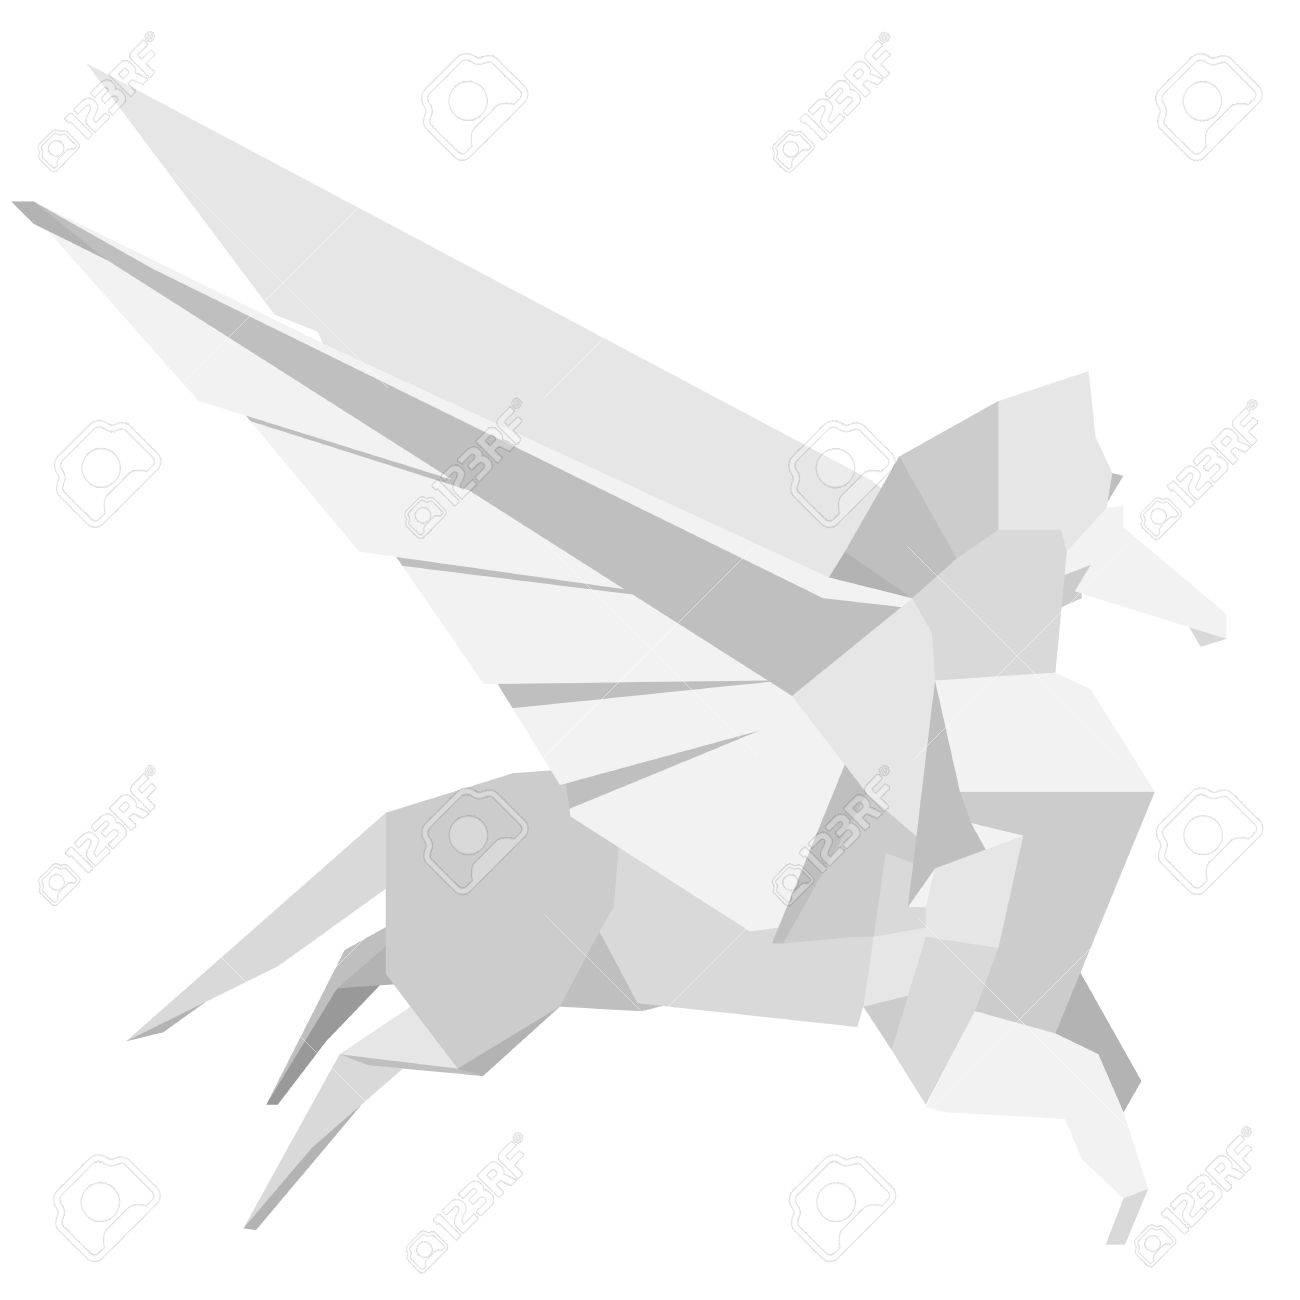 Illustration Of An Origami Pegasus Royalty Free Cliparts Vectors